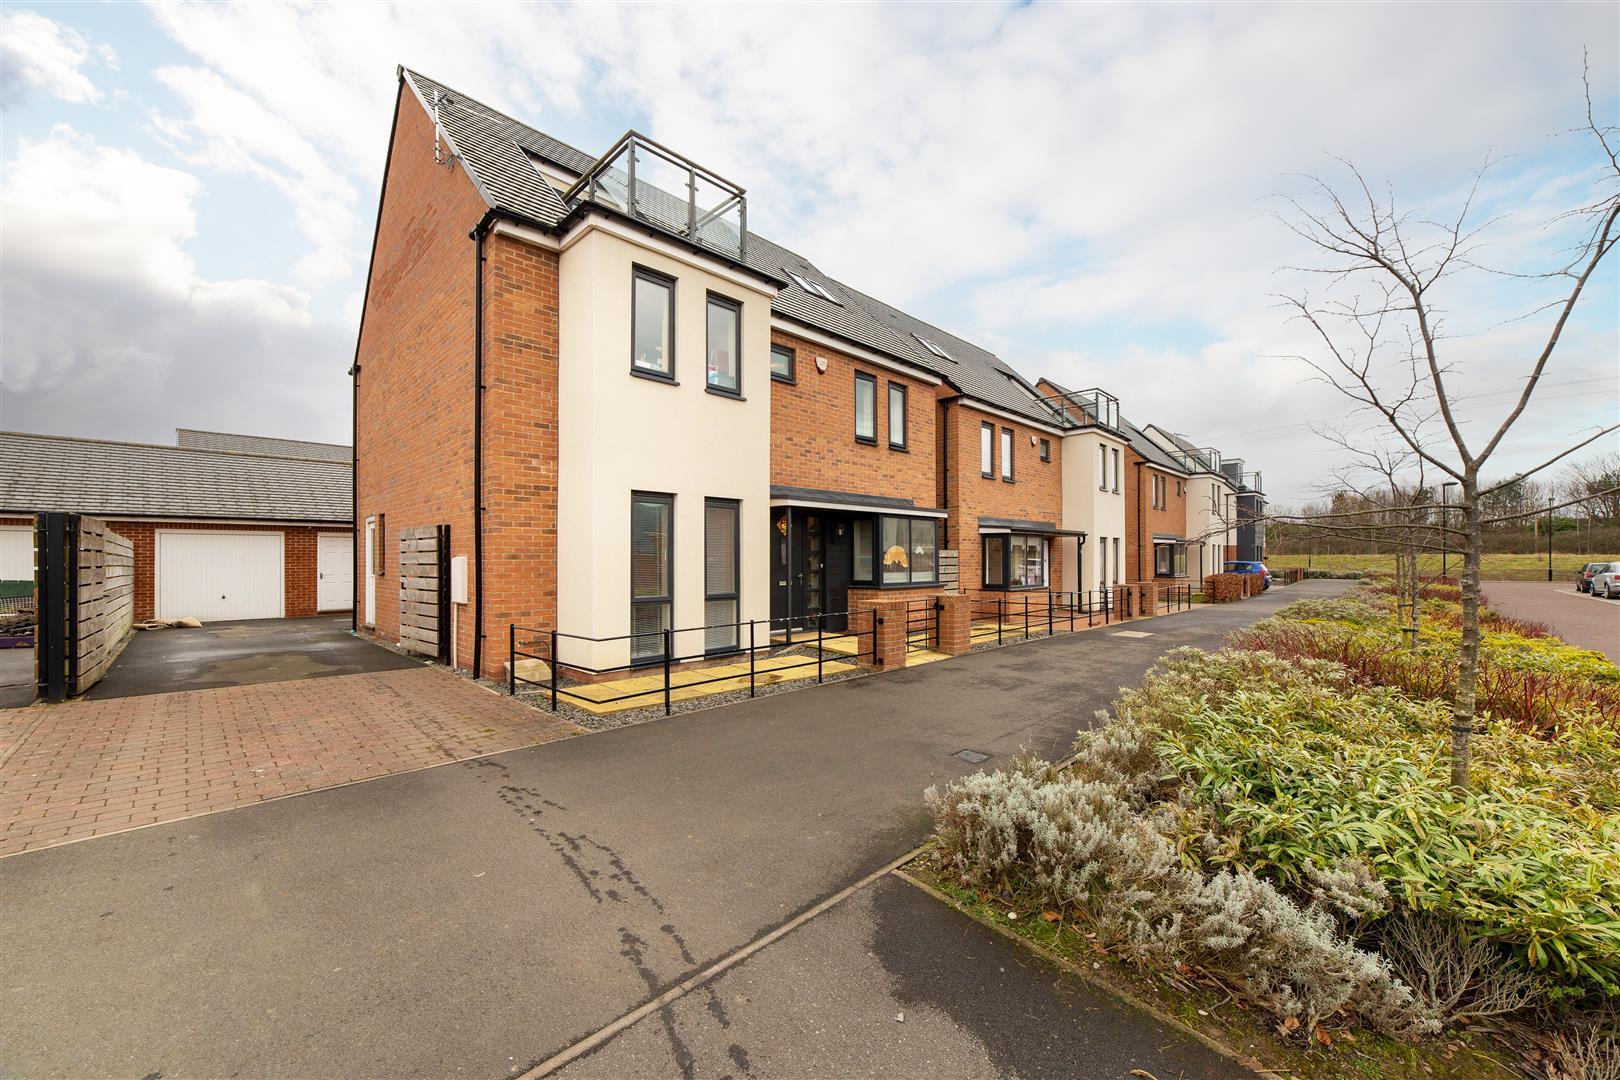 5 bed detached house for sale in Great Park, NE13 9AP, NE13